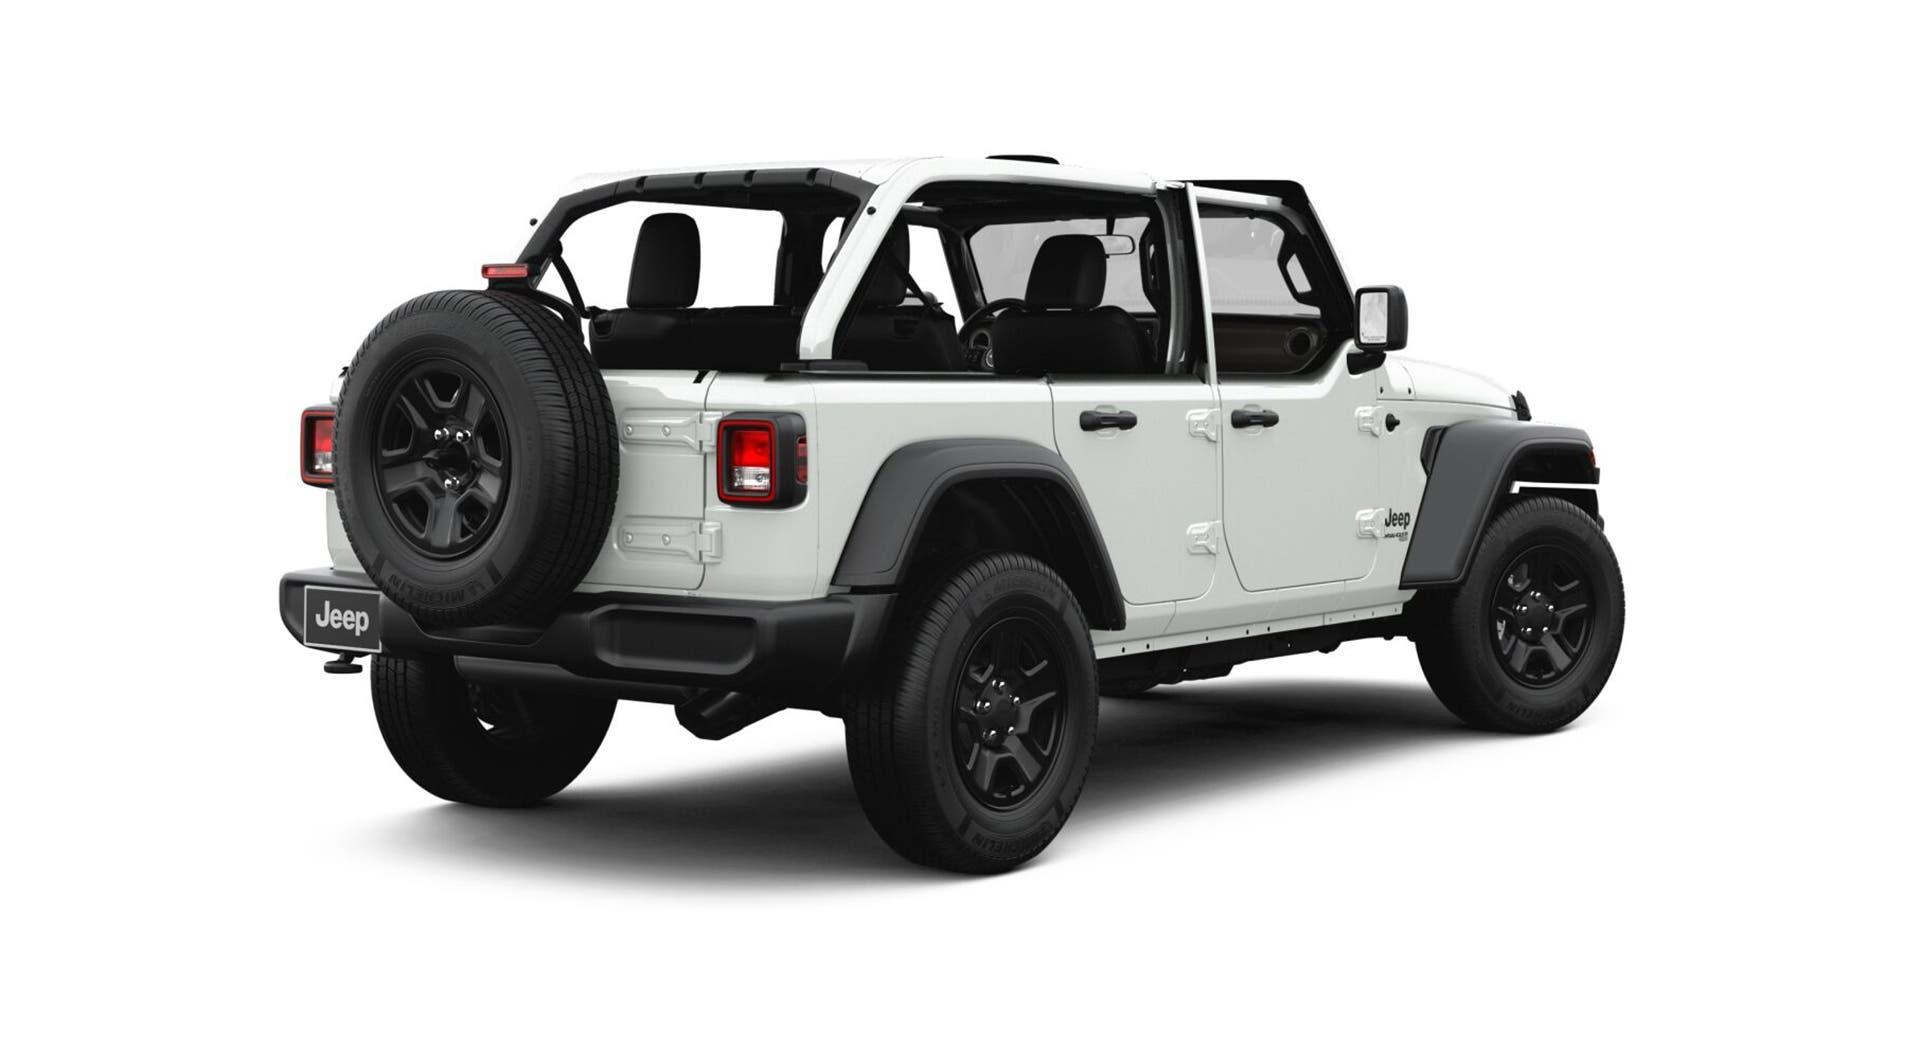 Jeep Wrangler JL mezze porte